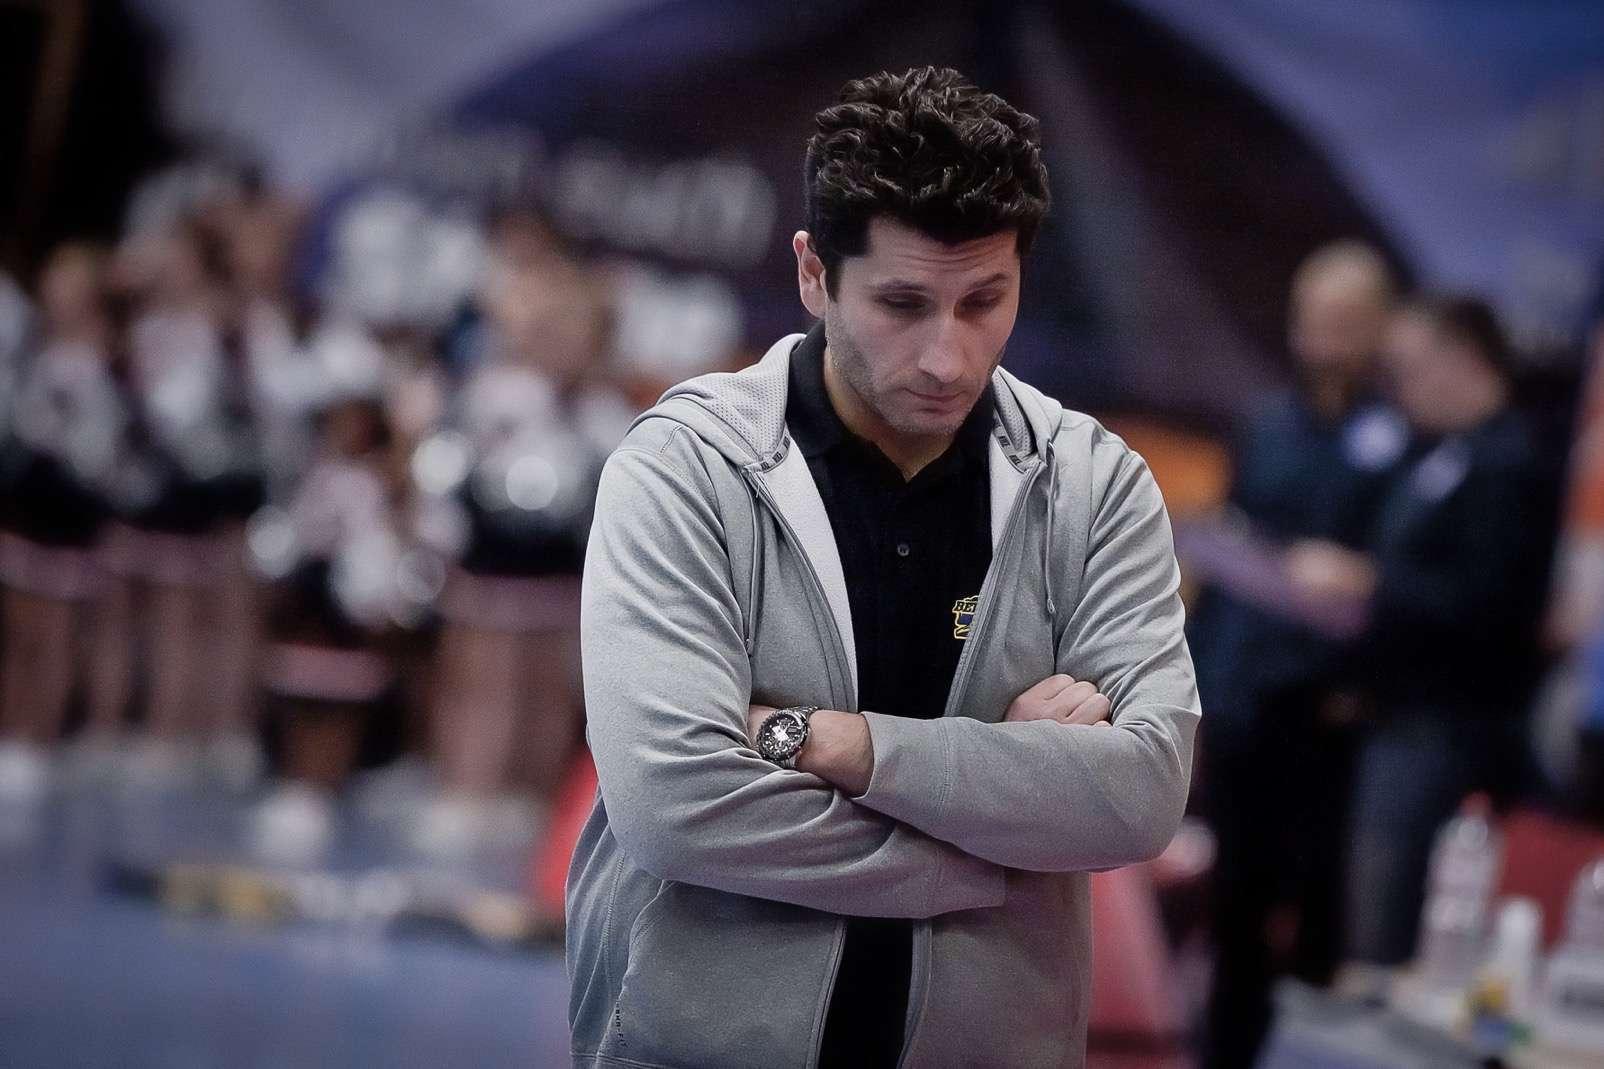 Lok Bernau: Knappe Niederlage bei den Dresden Titans